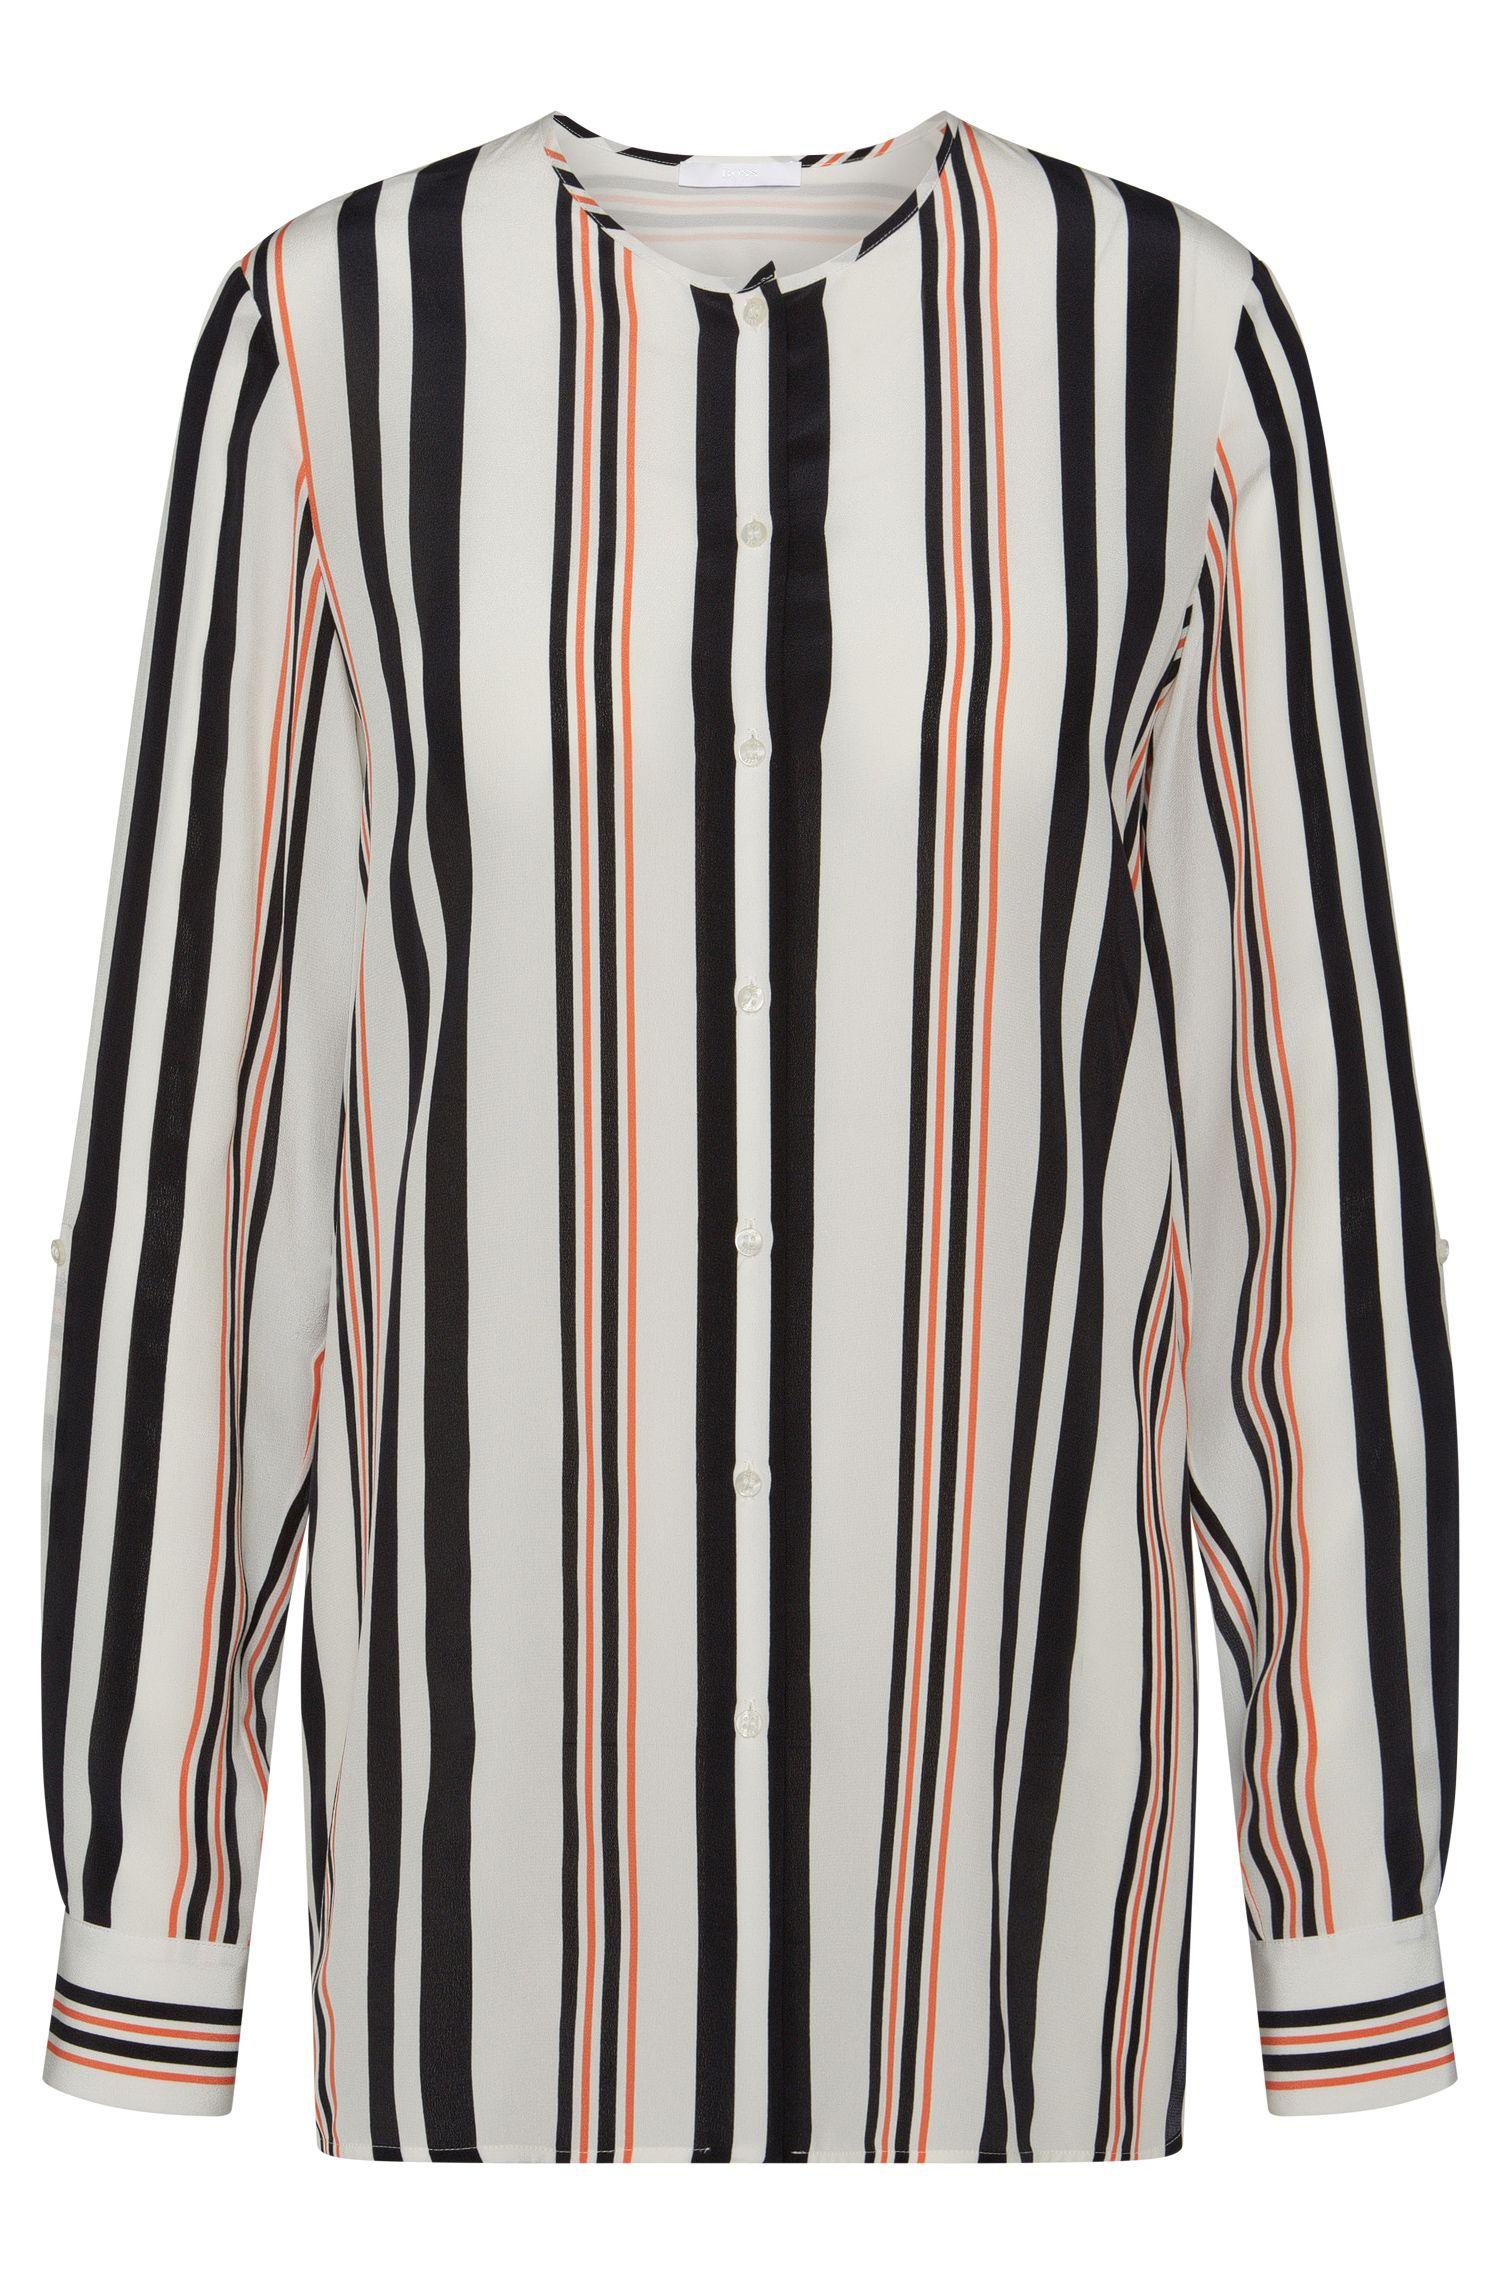 'Relliana' | Silk Striped Blouse